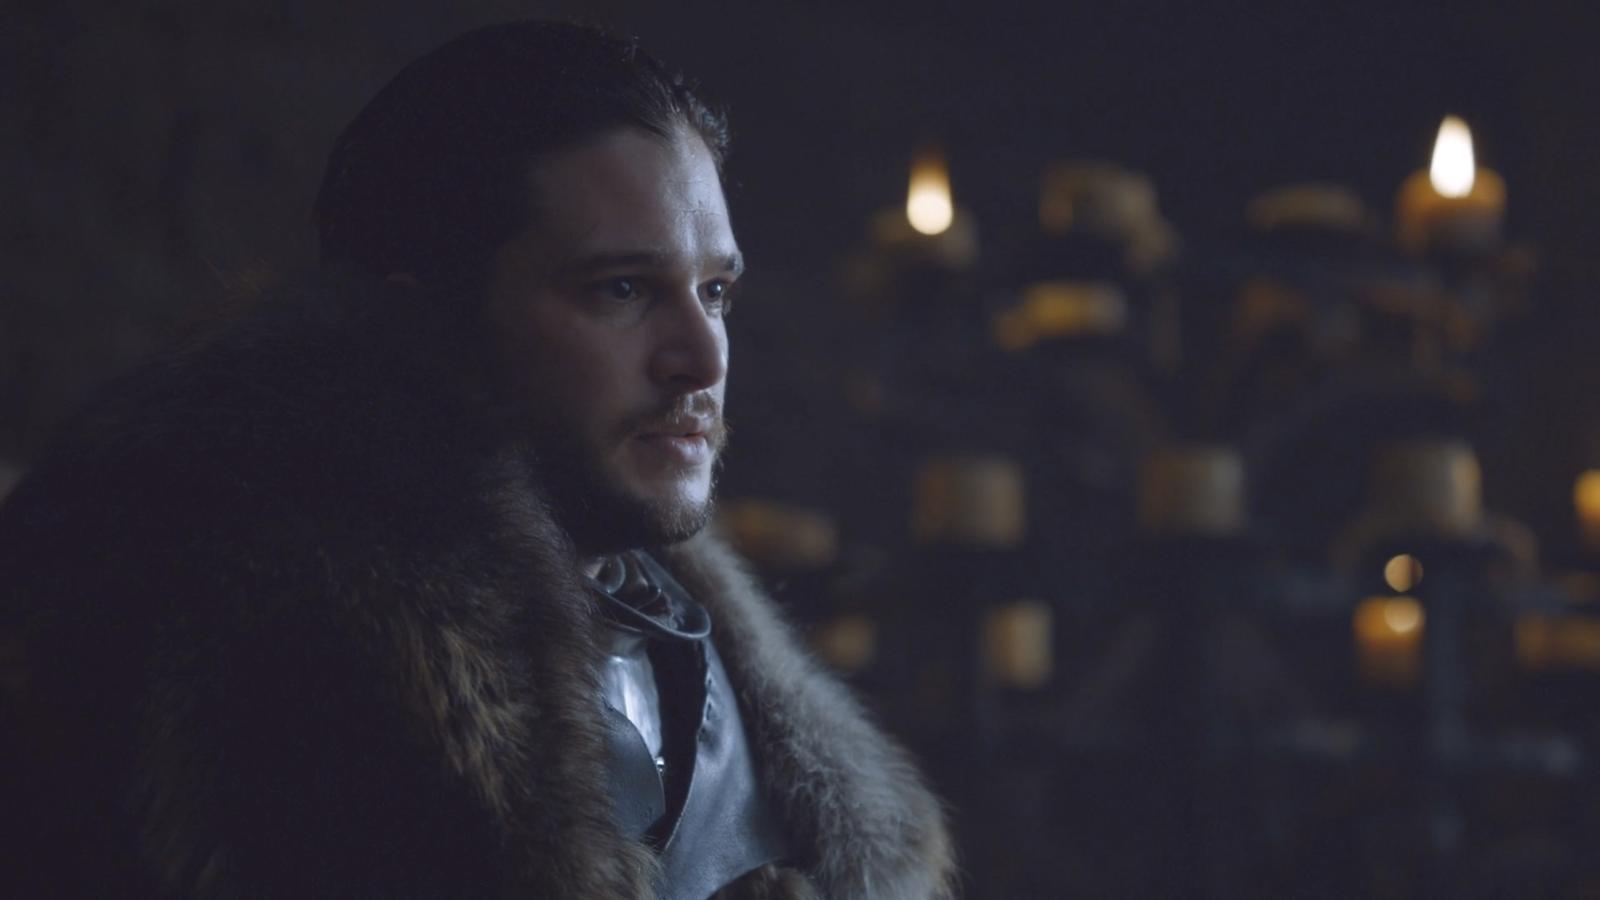 'Game of Thrones' Teaser Promises Daenerys, Jon Snow Meeting